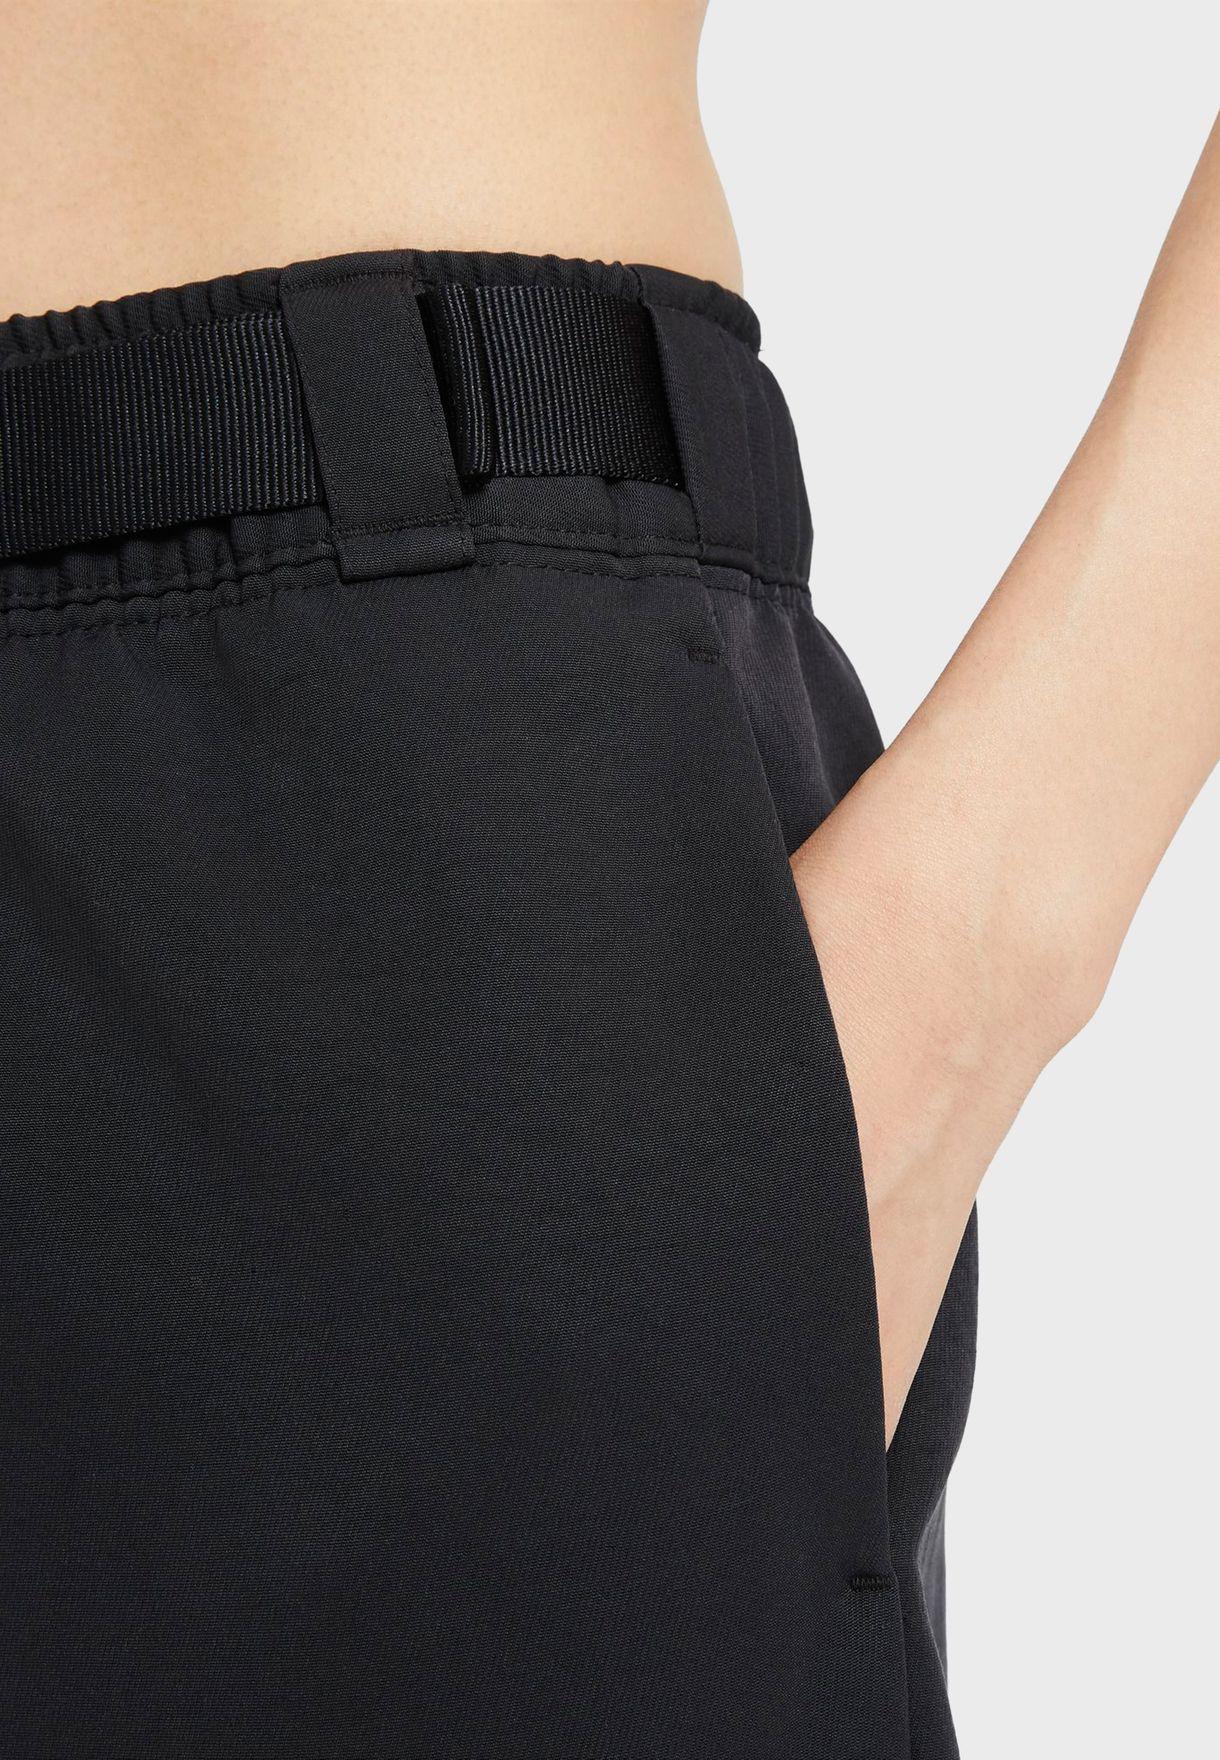 NSW Tech Pack Sweatpants